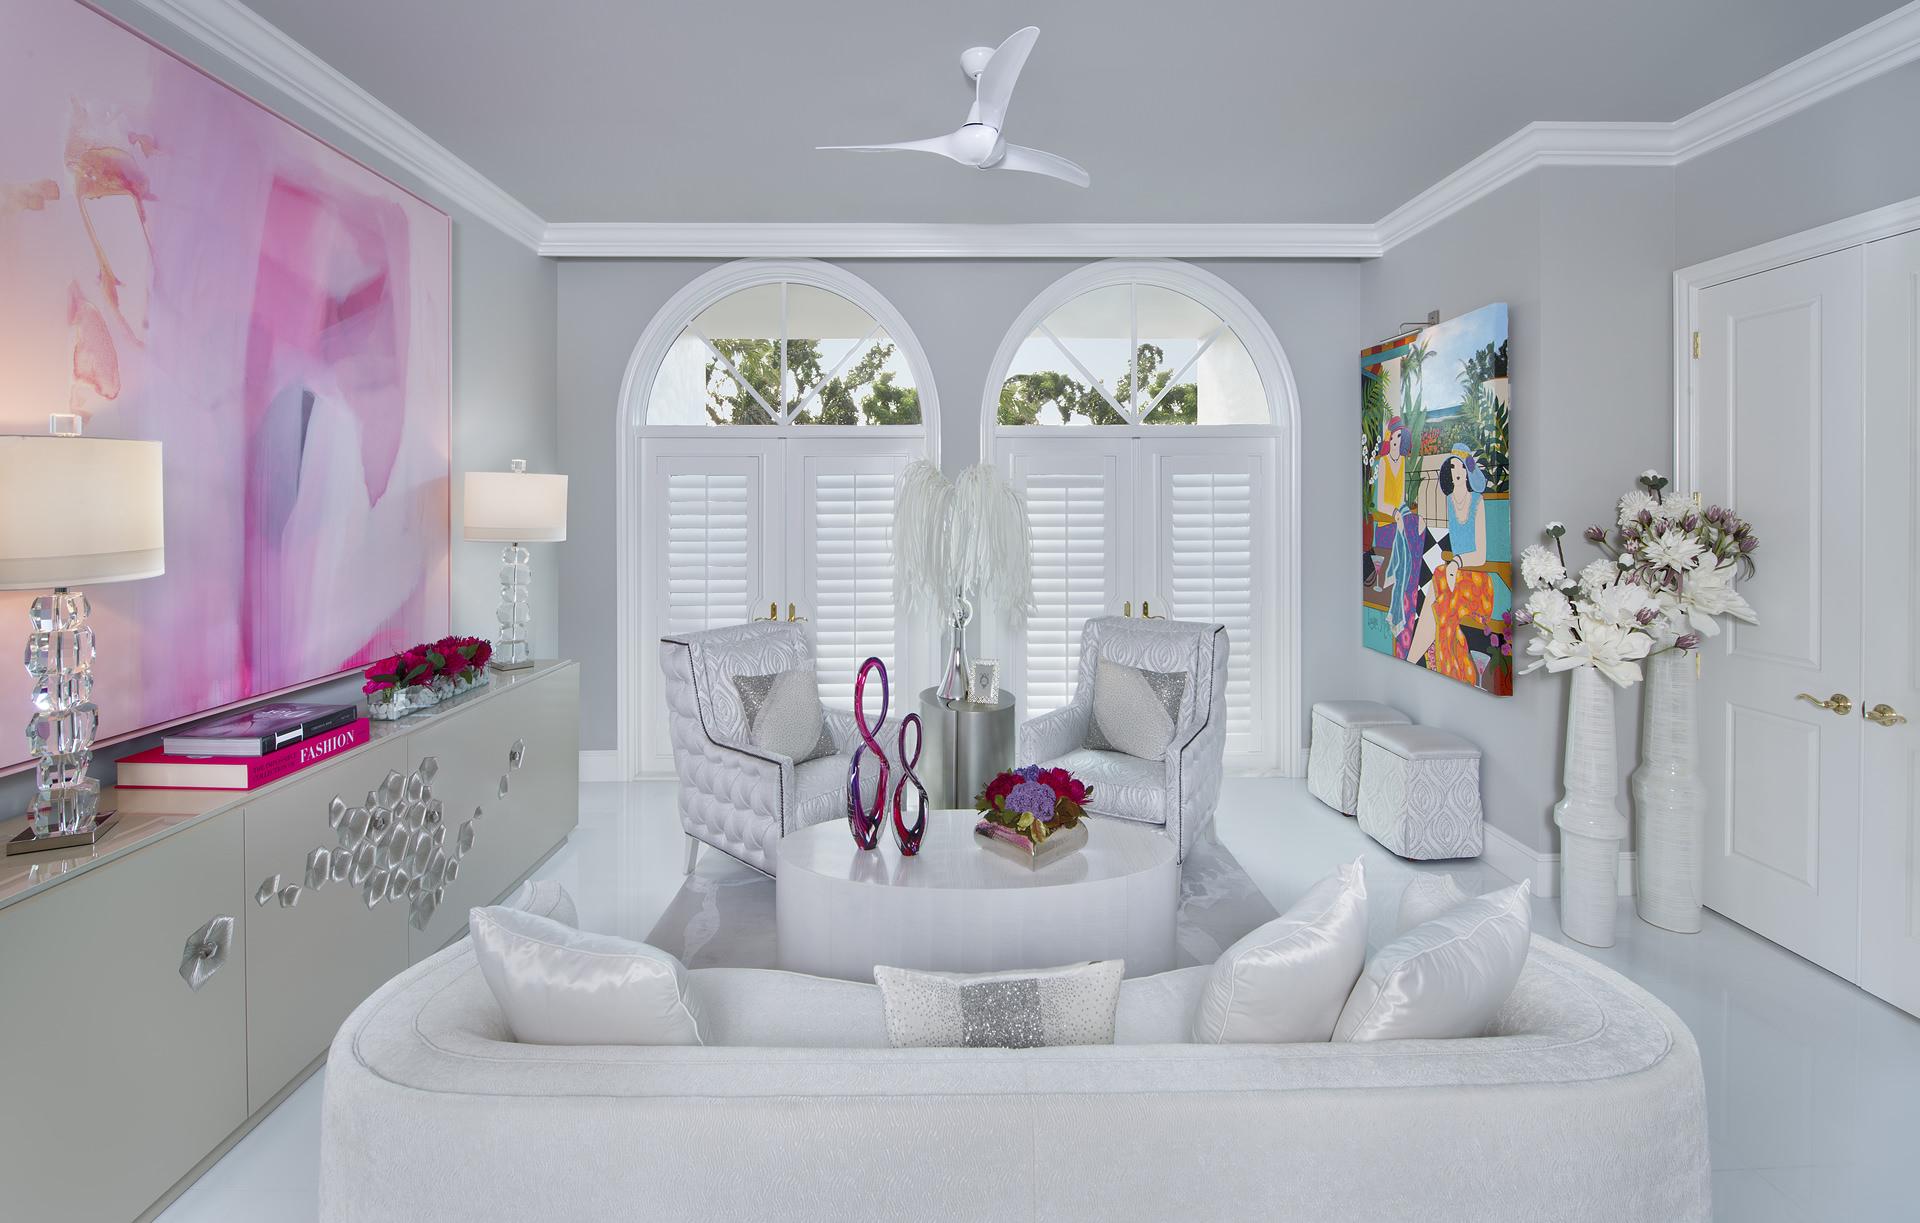 Dwayne Bergmann Interiors Featured in Naples Illustrated